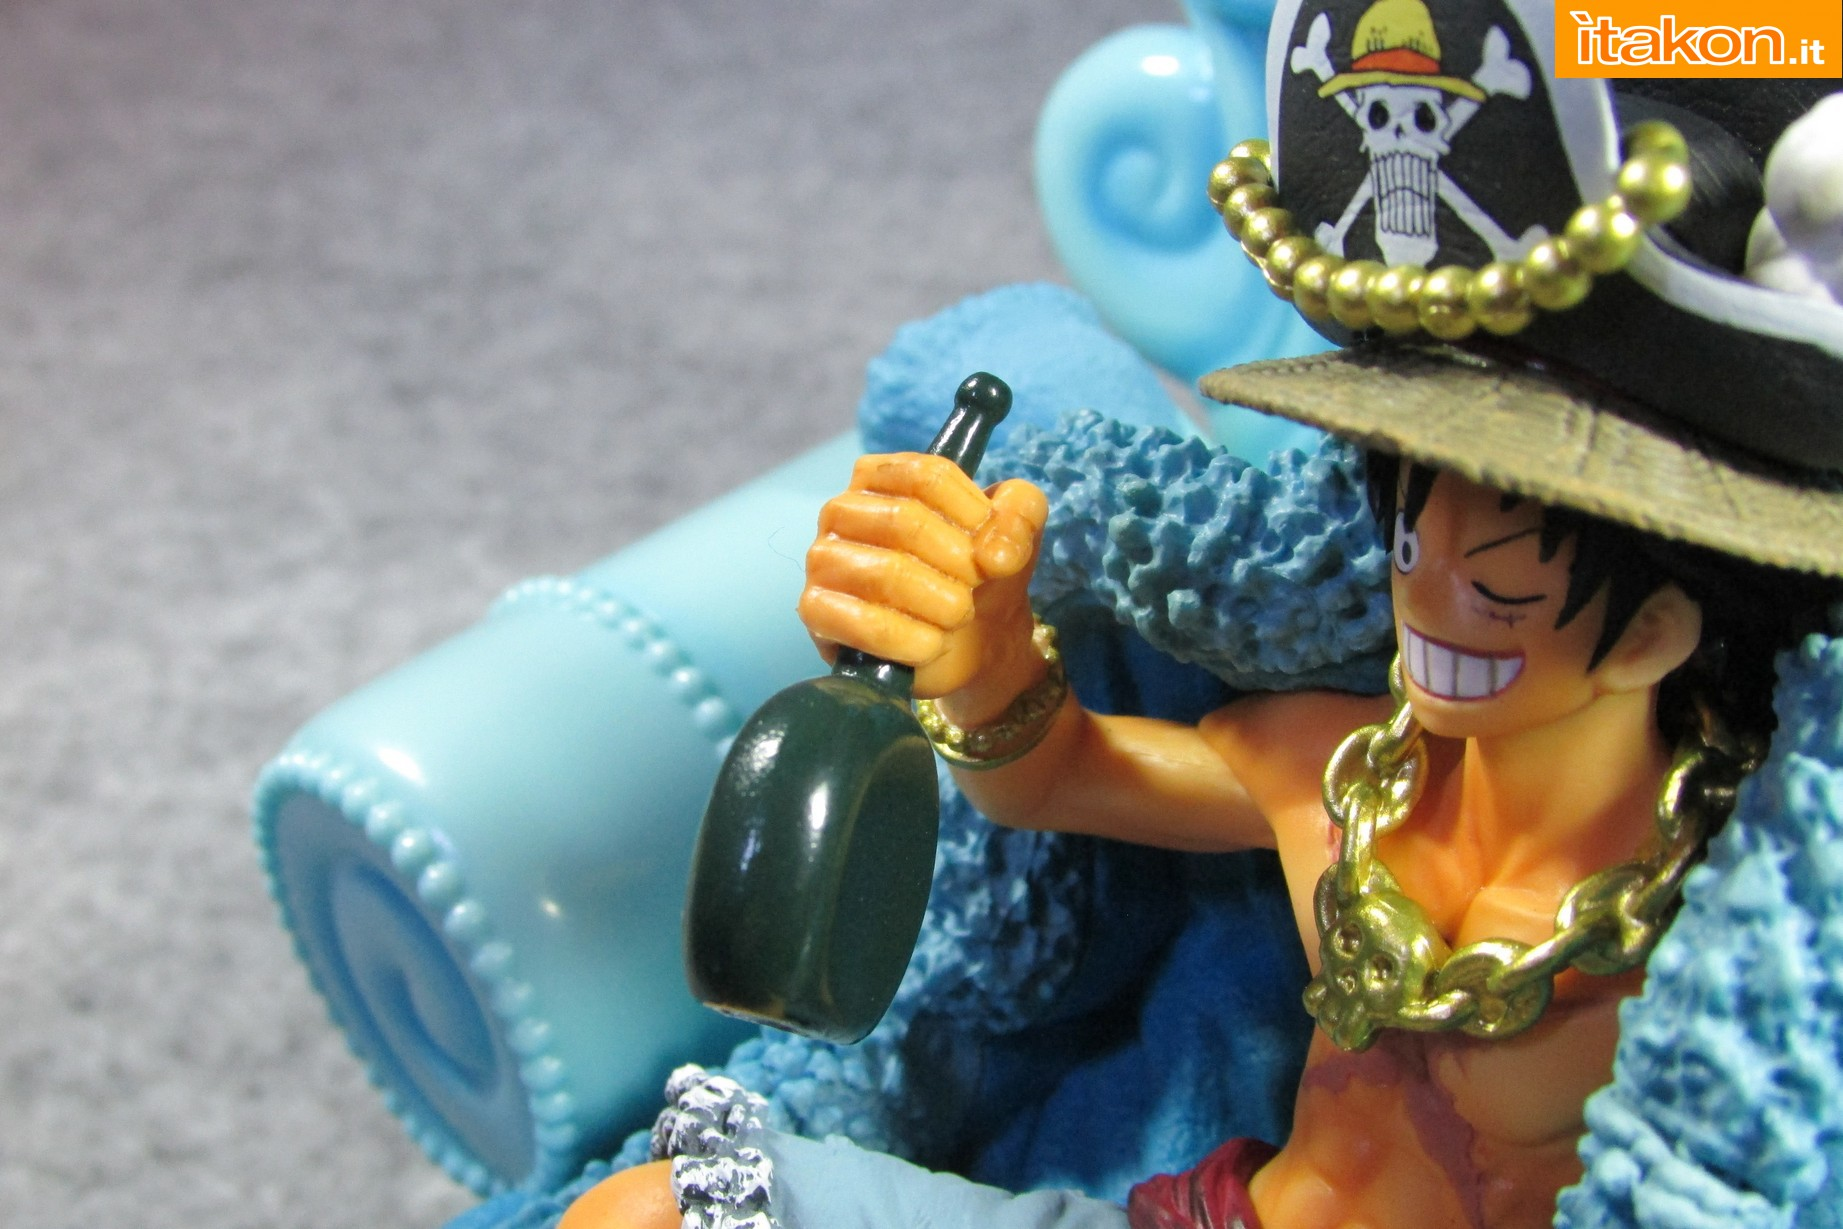 Link a Recensione Review Monkey D. Luffy One Piece 20th Anniversary ver. Figuarts ZERO di Bandai 35